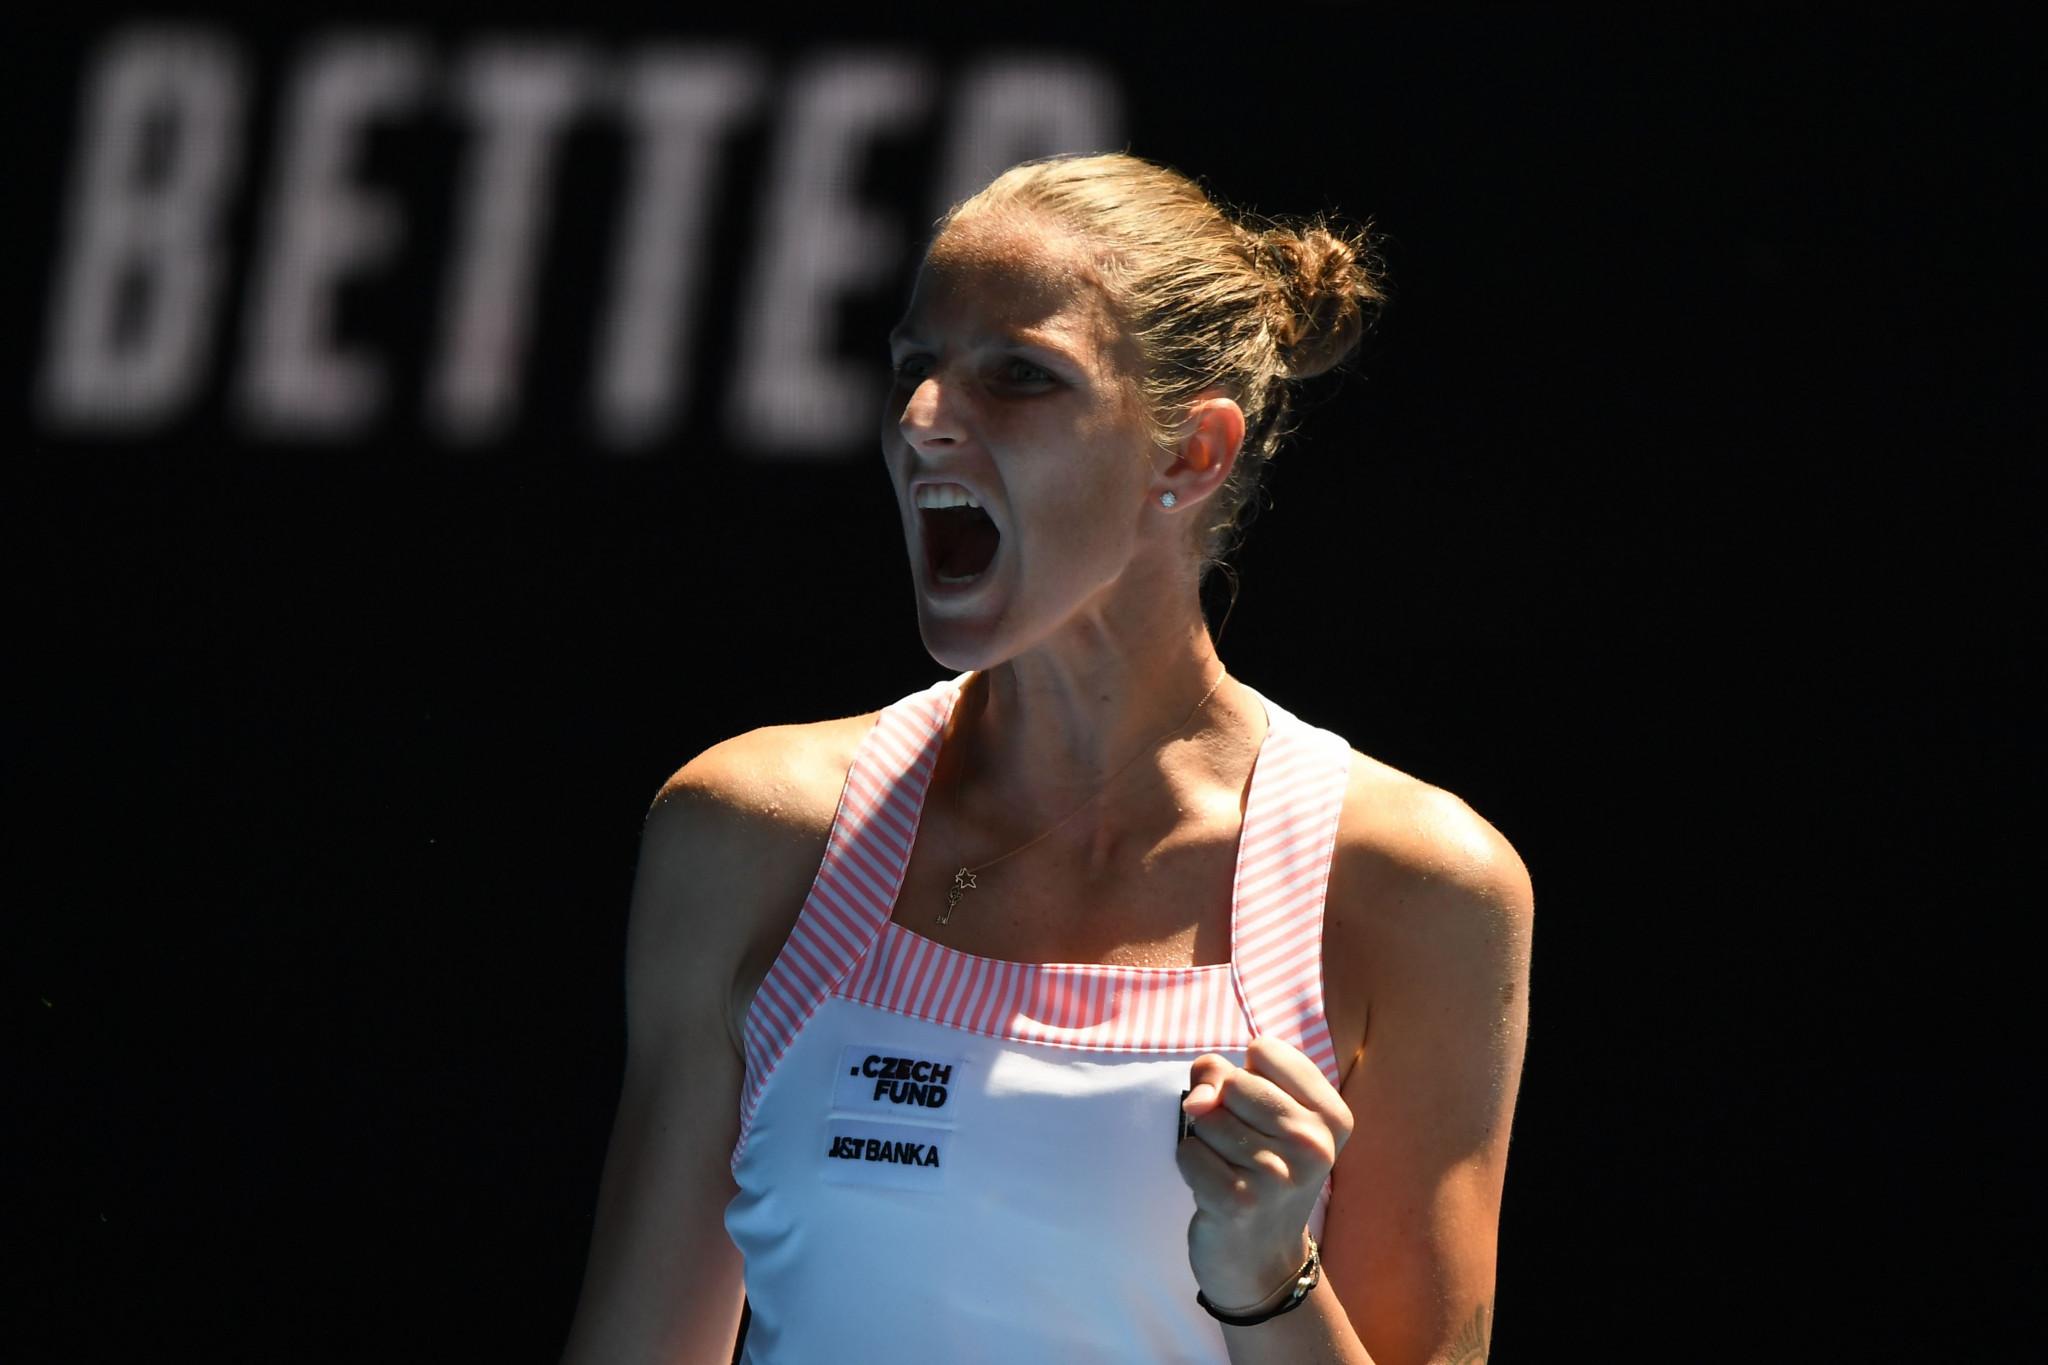 Plíšková beats Williams as Djokovic progresses after Nishikori retirement at Australian Open